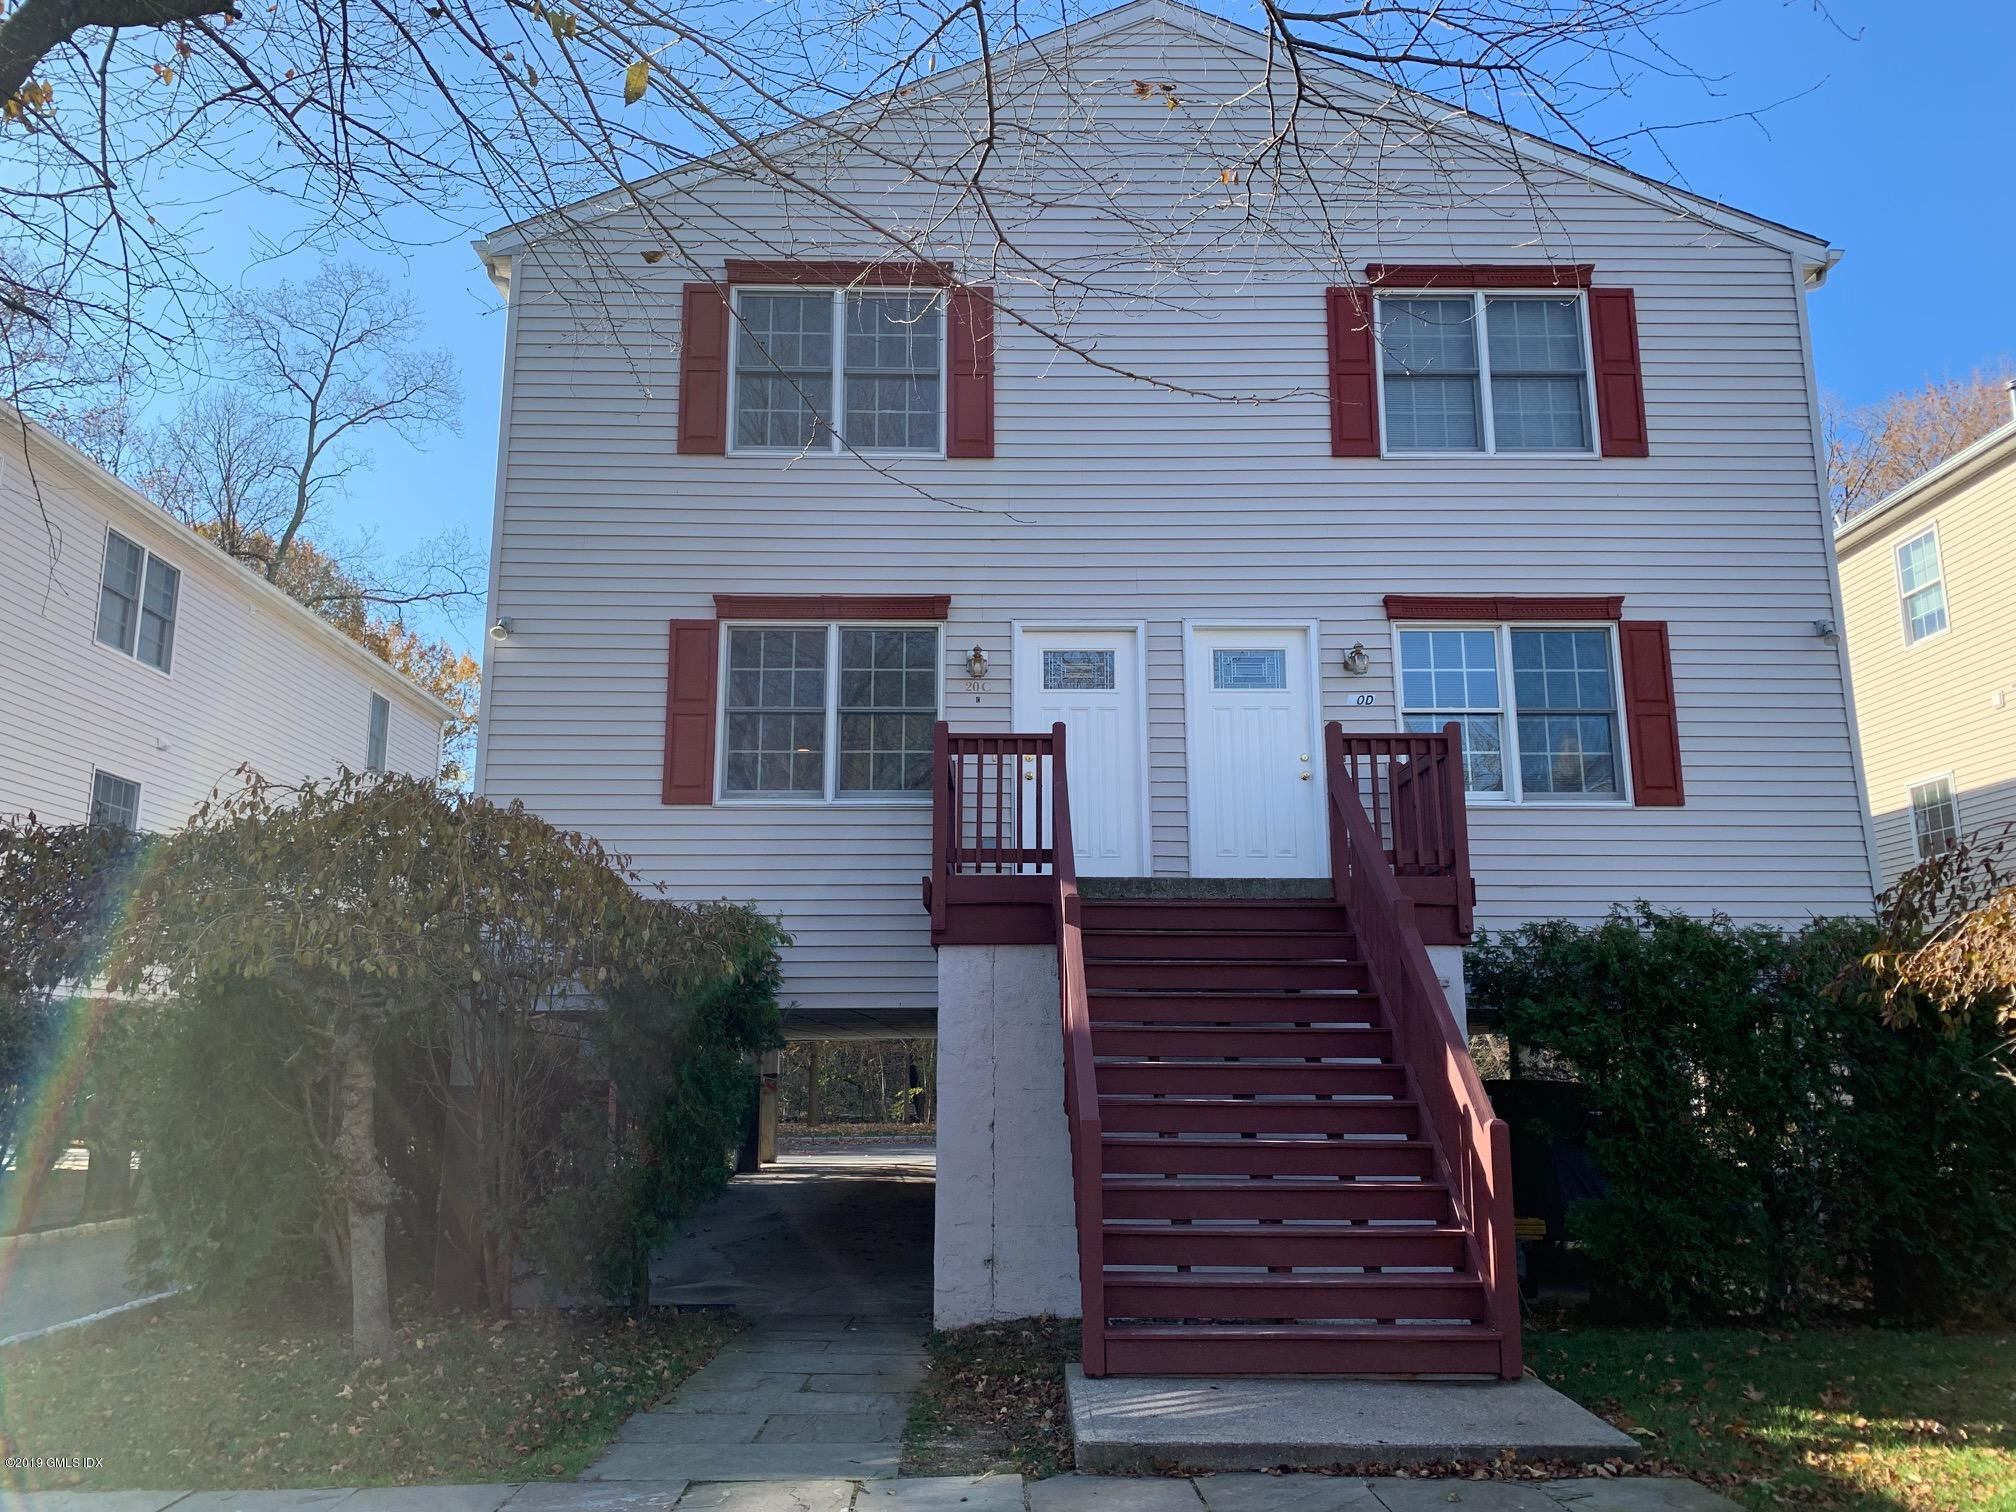 20 Hollow Wood Lane,Greenwich,Connecticut 06831,3 Bedrooms Bedrooms,2 BathroomsBathrooms,Condominium,Hollow Wood,108333